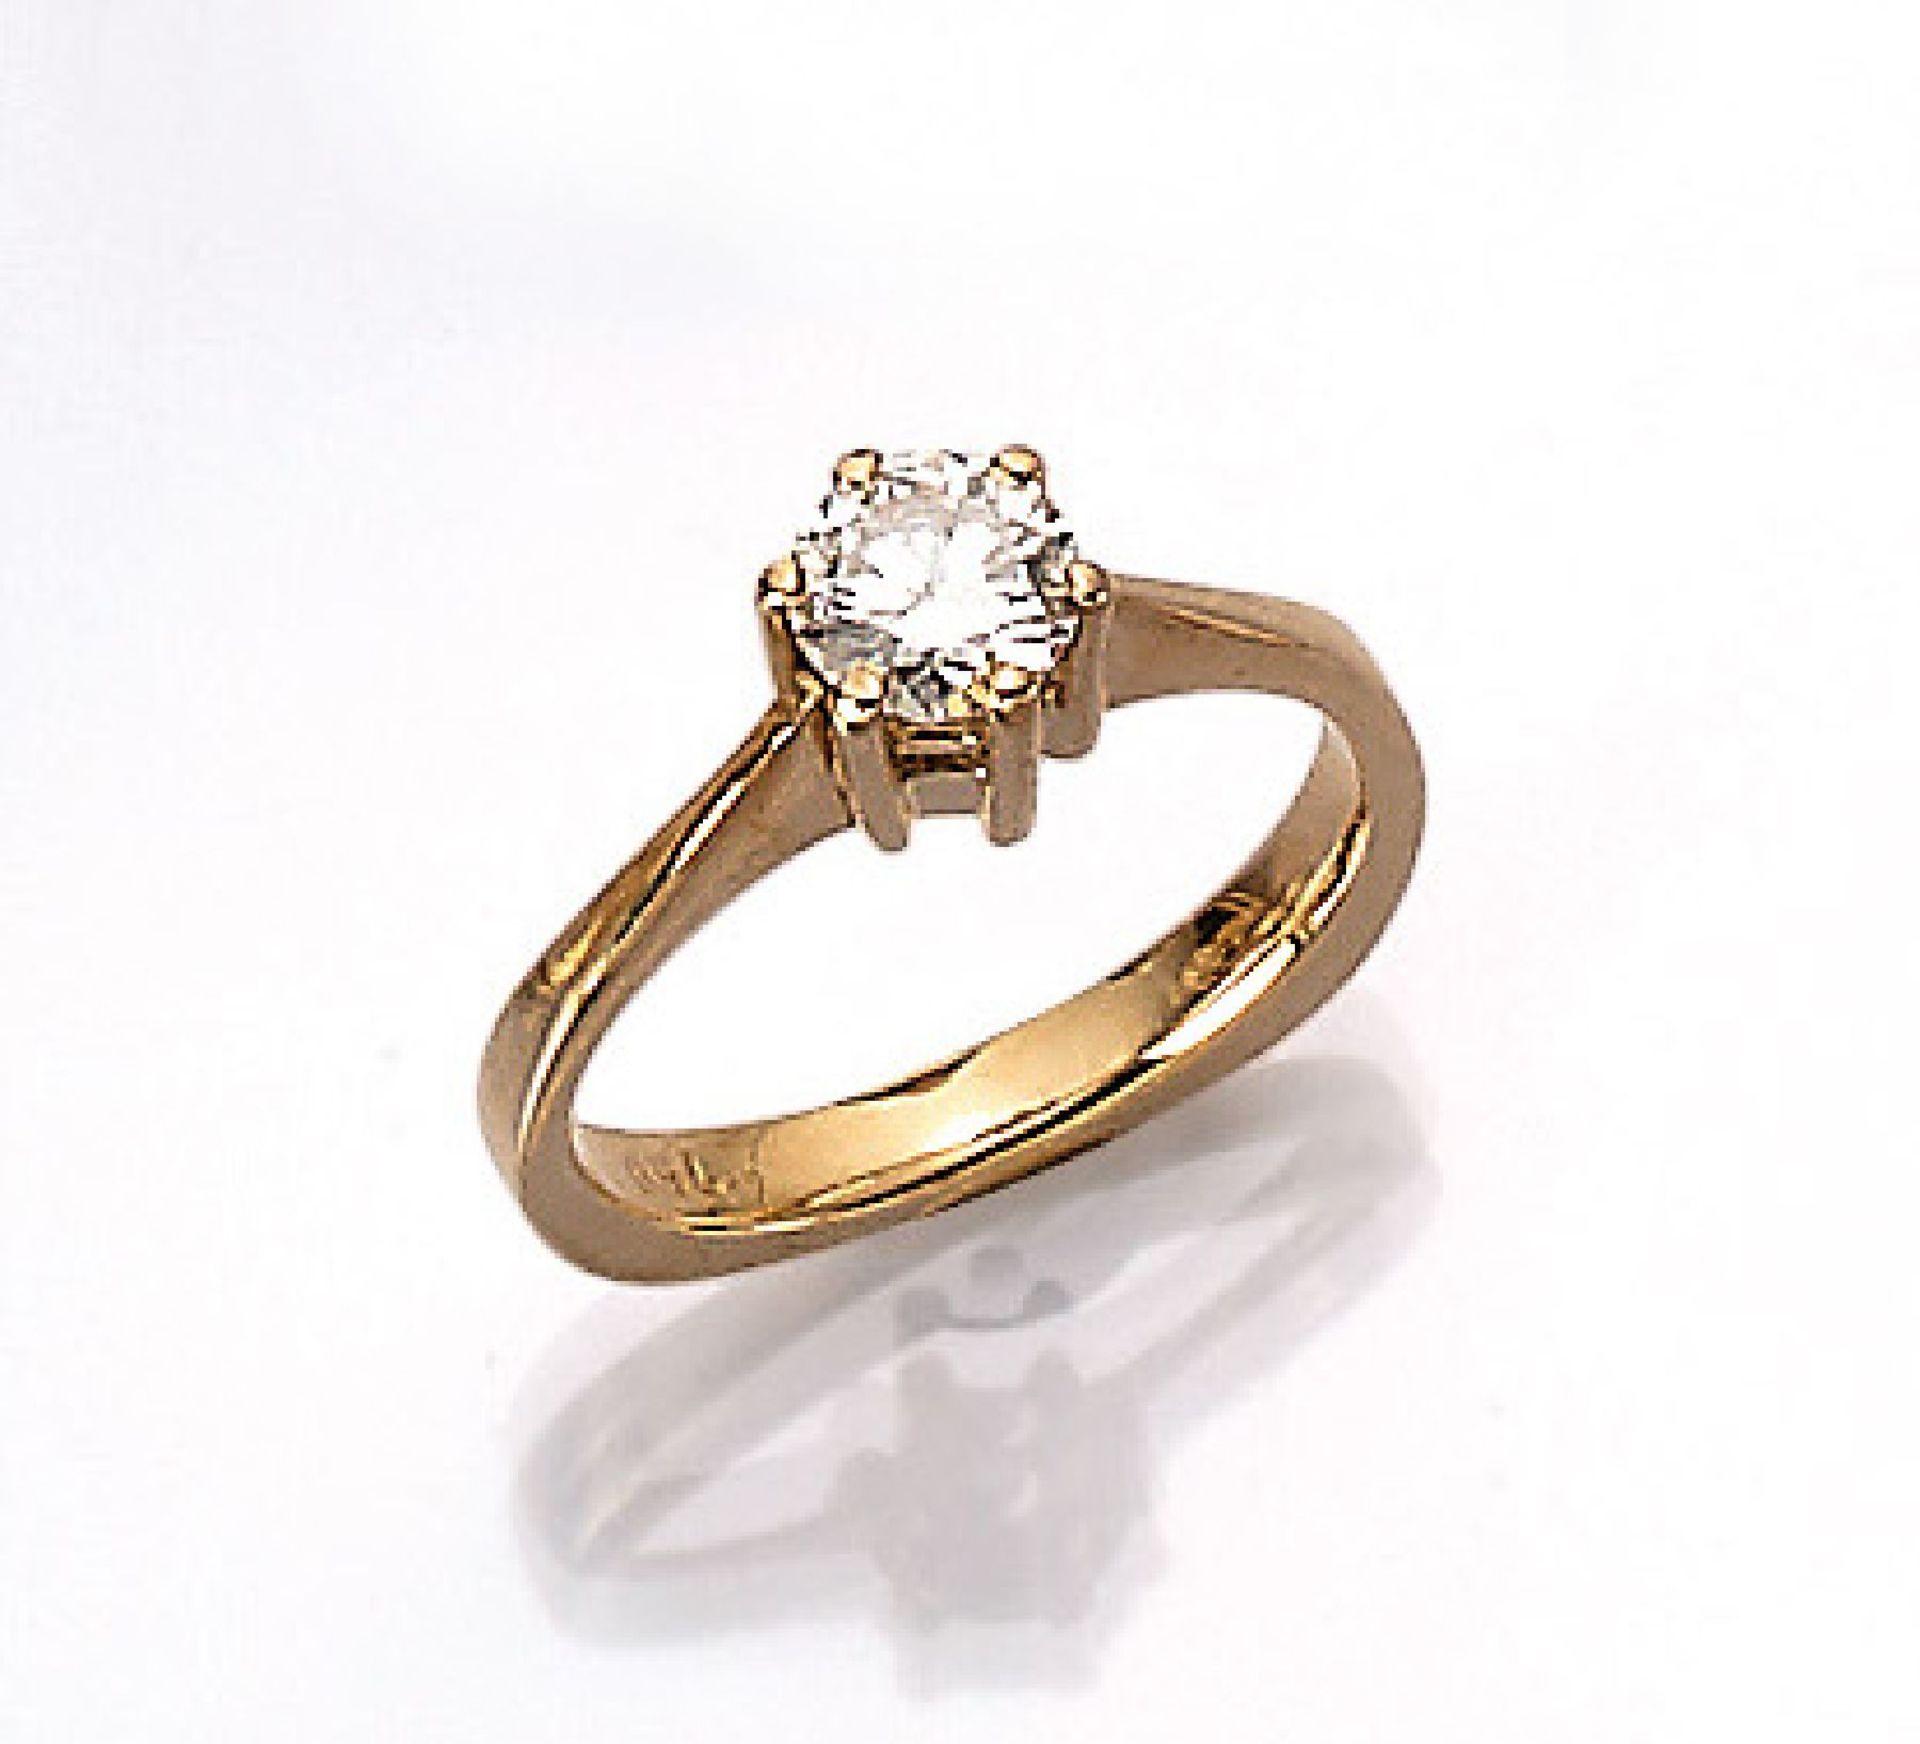 18 kt Gold Ring mit Brillant, GG 750/000, Brillant ca. 0.63 ct feines Weiß/vs1, RW 51, ca. 4.4 g